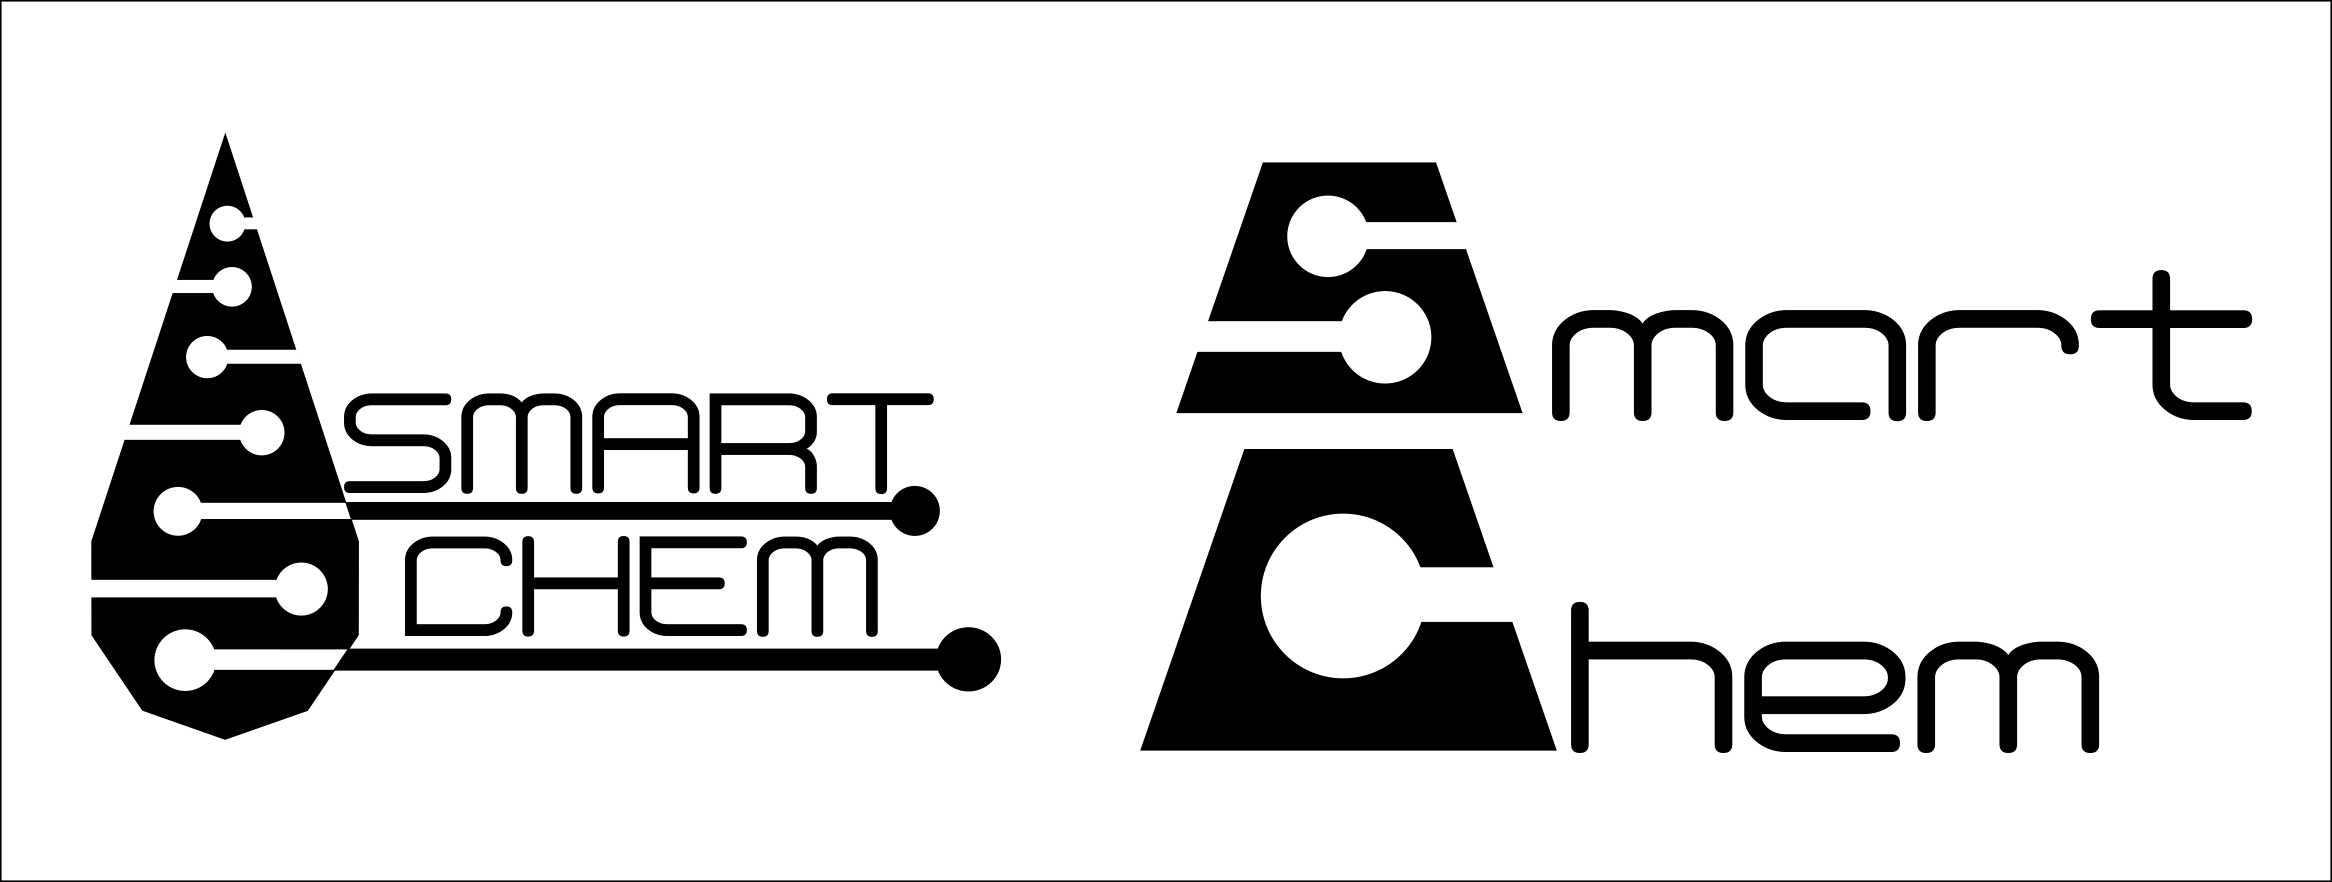 Логотип для компании фото f_2895a8c049b1c2c0.jpg